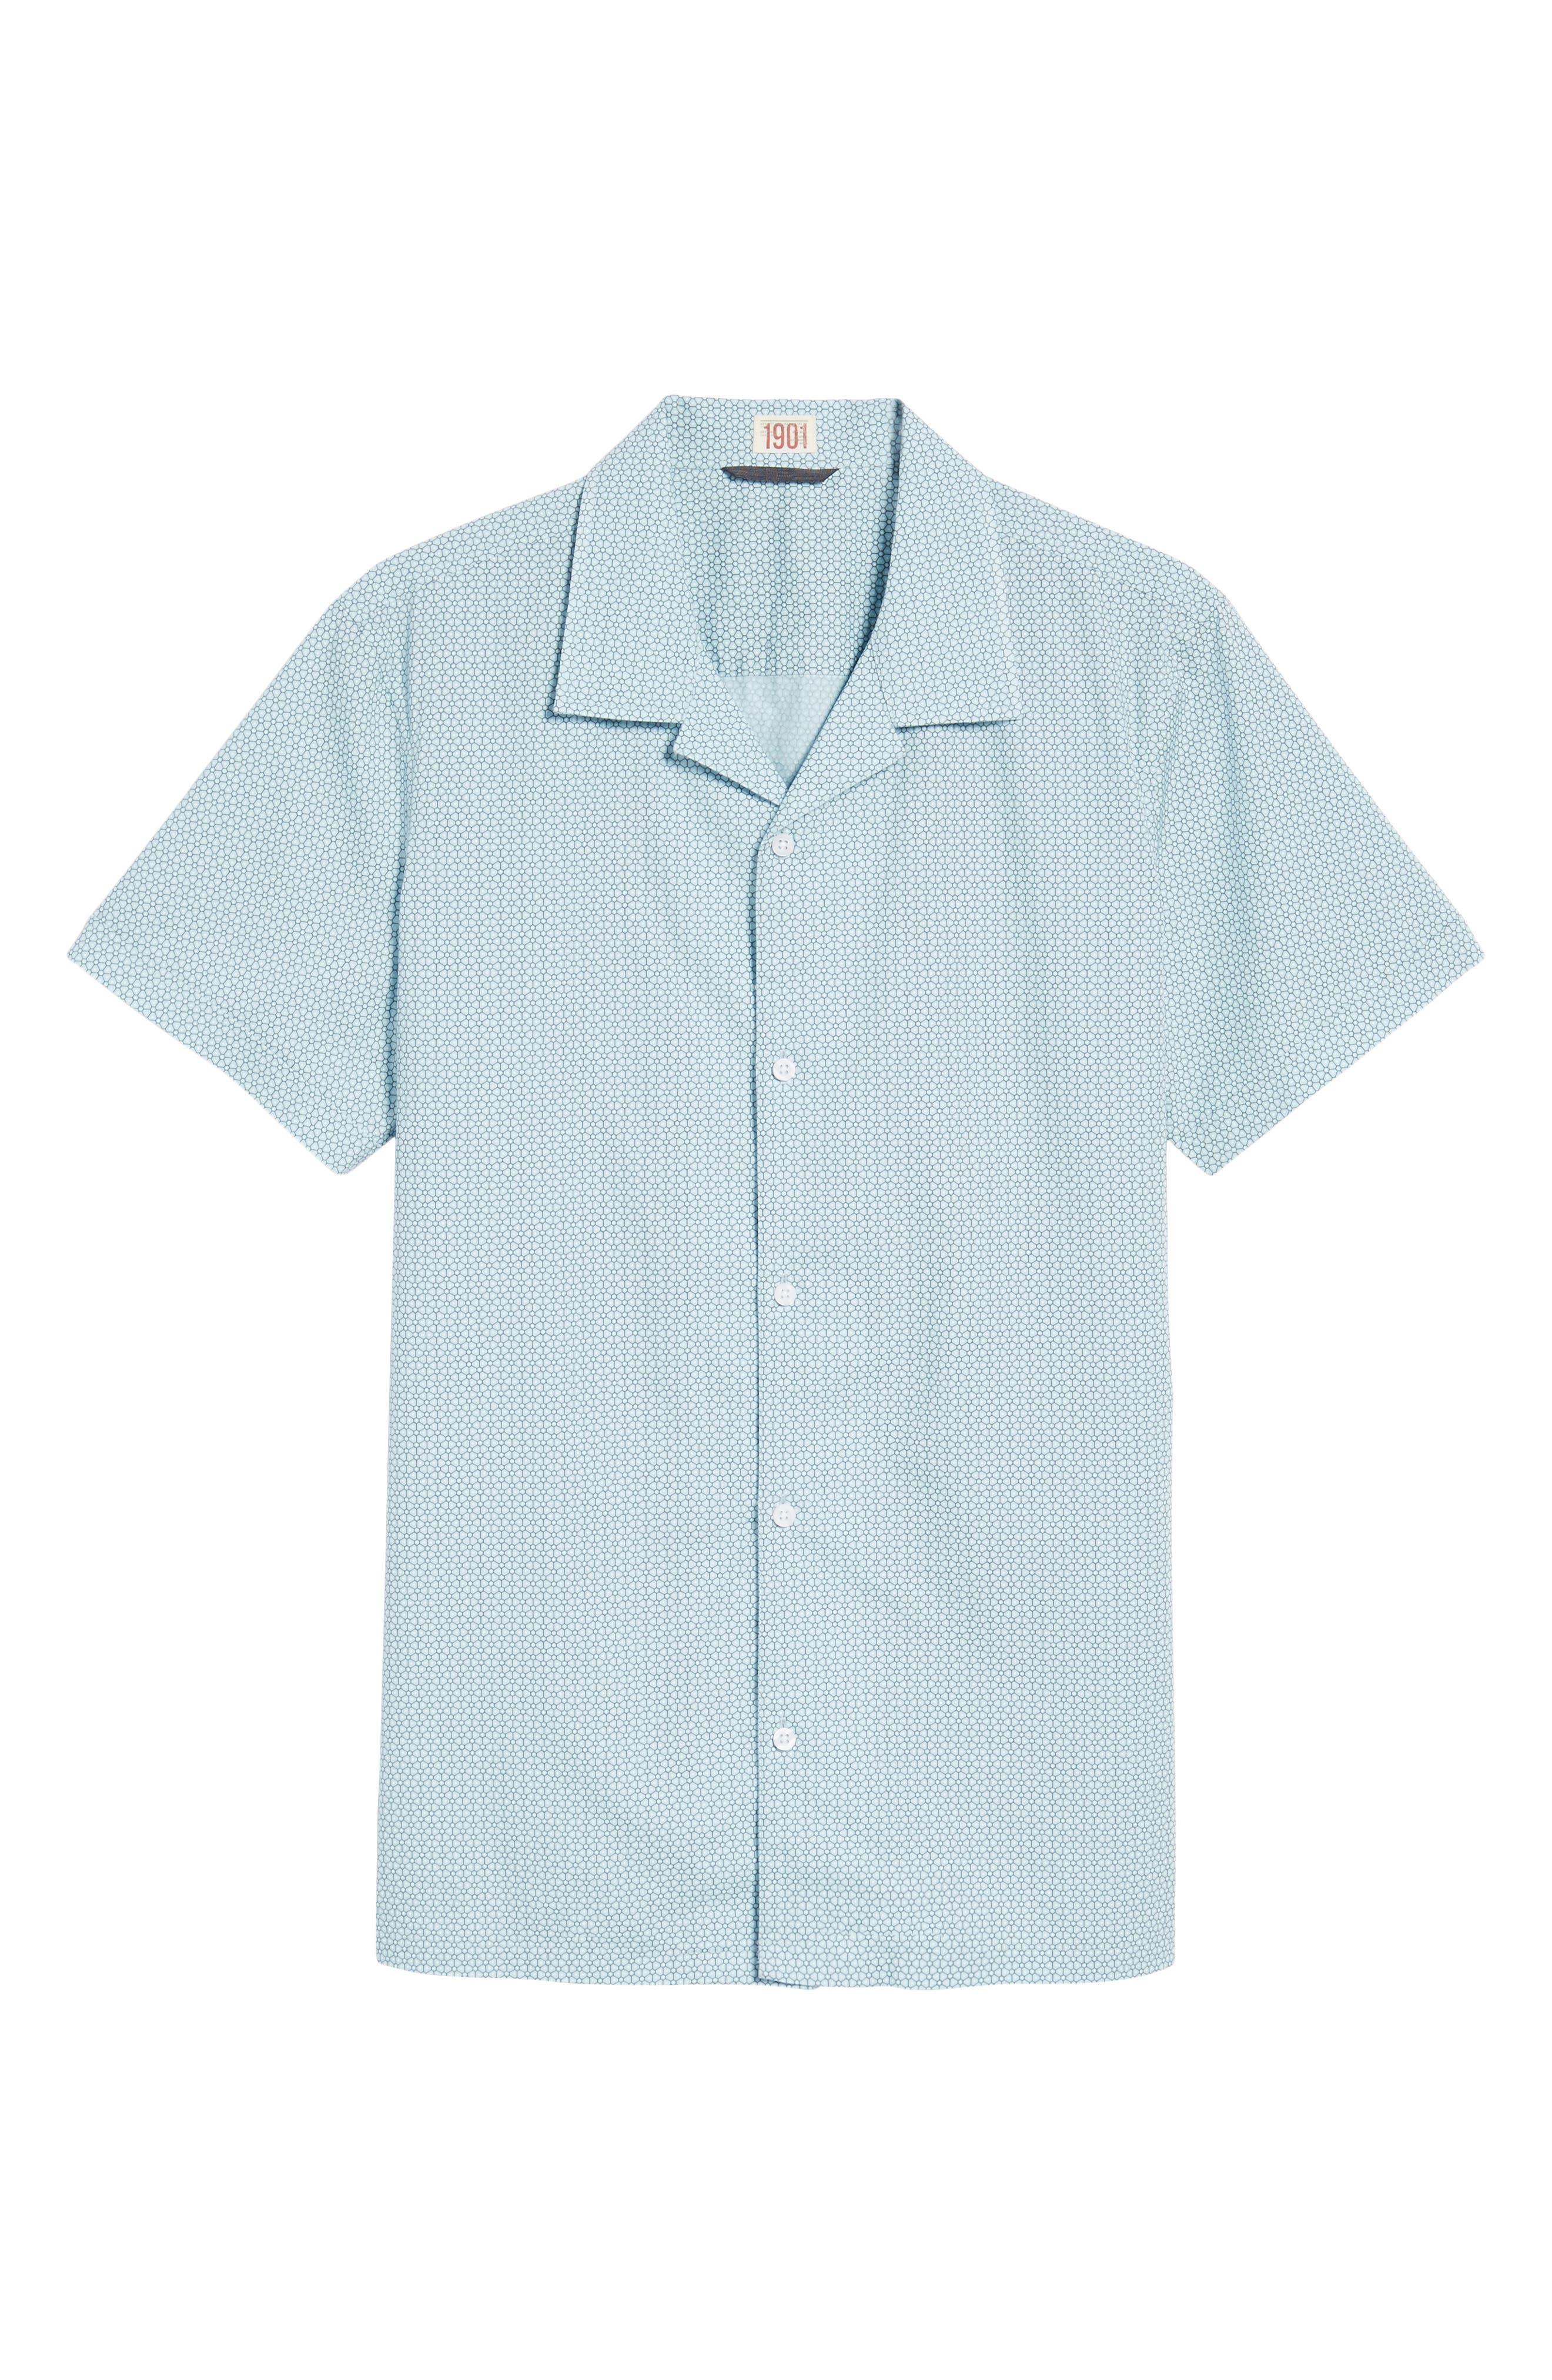 Trim Fit Stretch Geometric Camp Shirt,                             Alternate thumbnail 6, color,                             Blue Orydalis Honeycomb